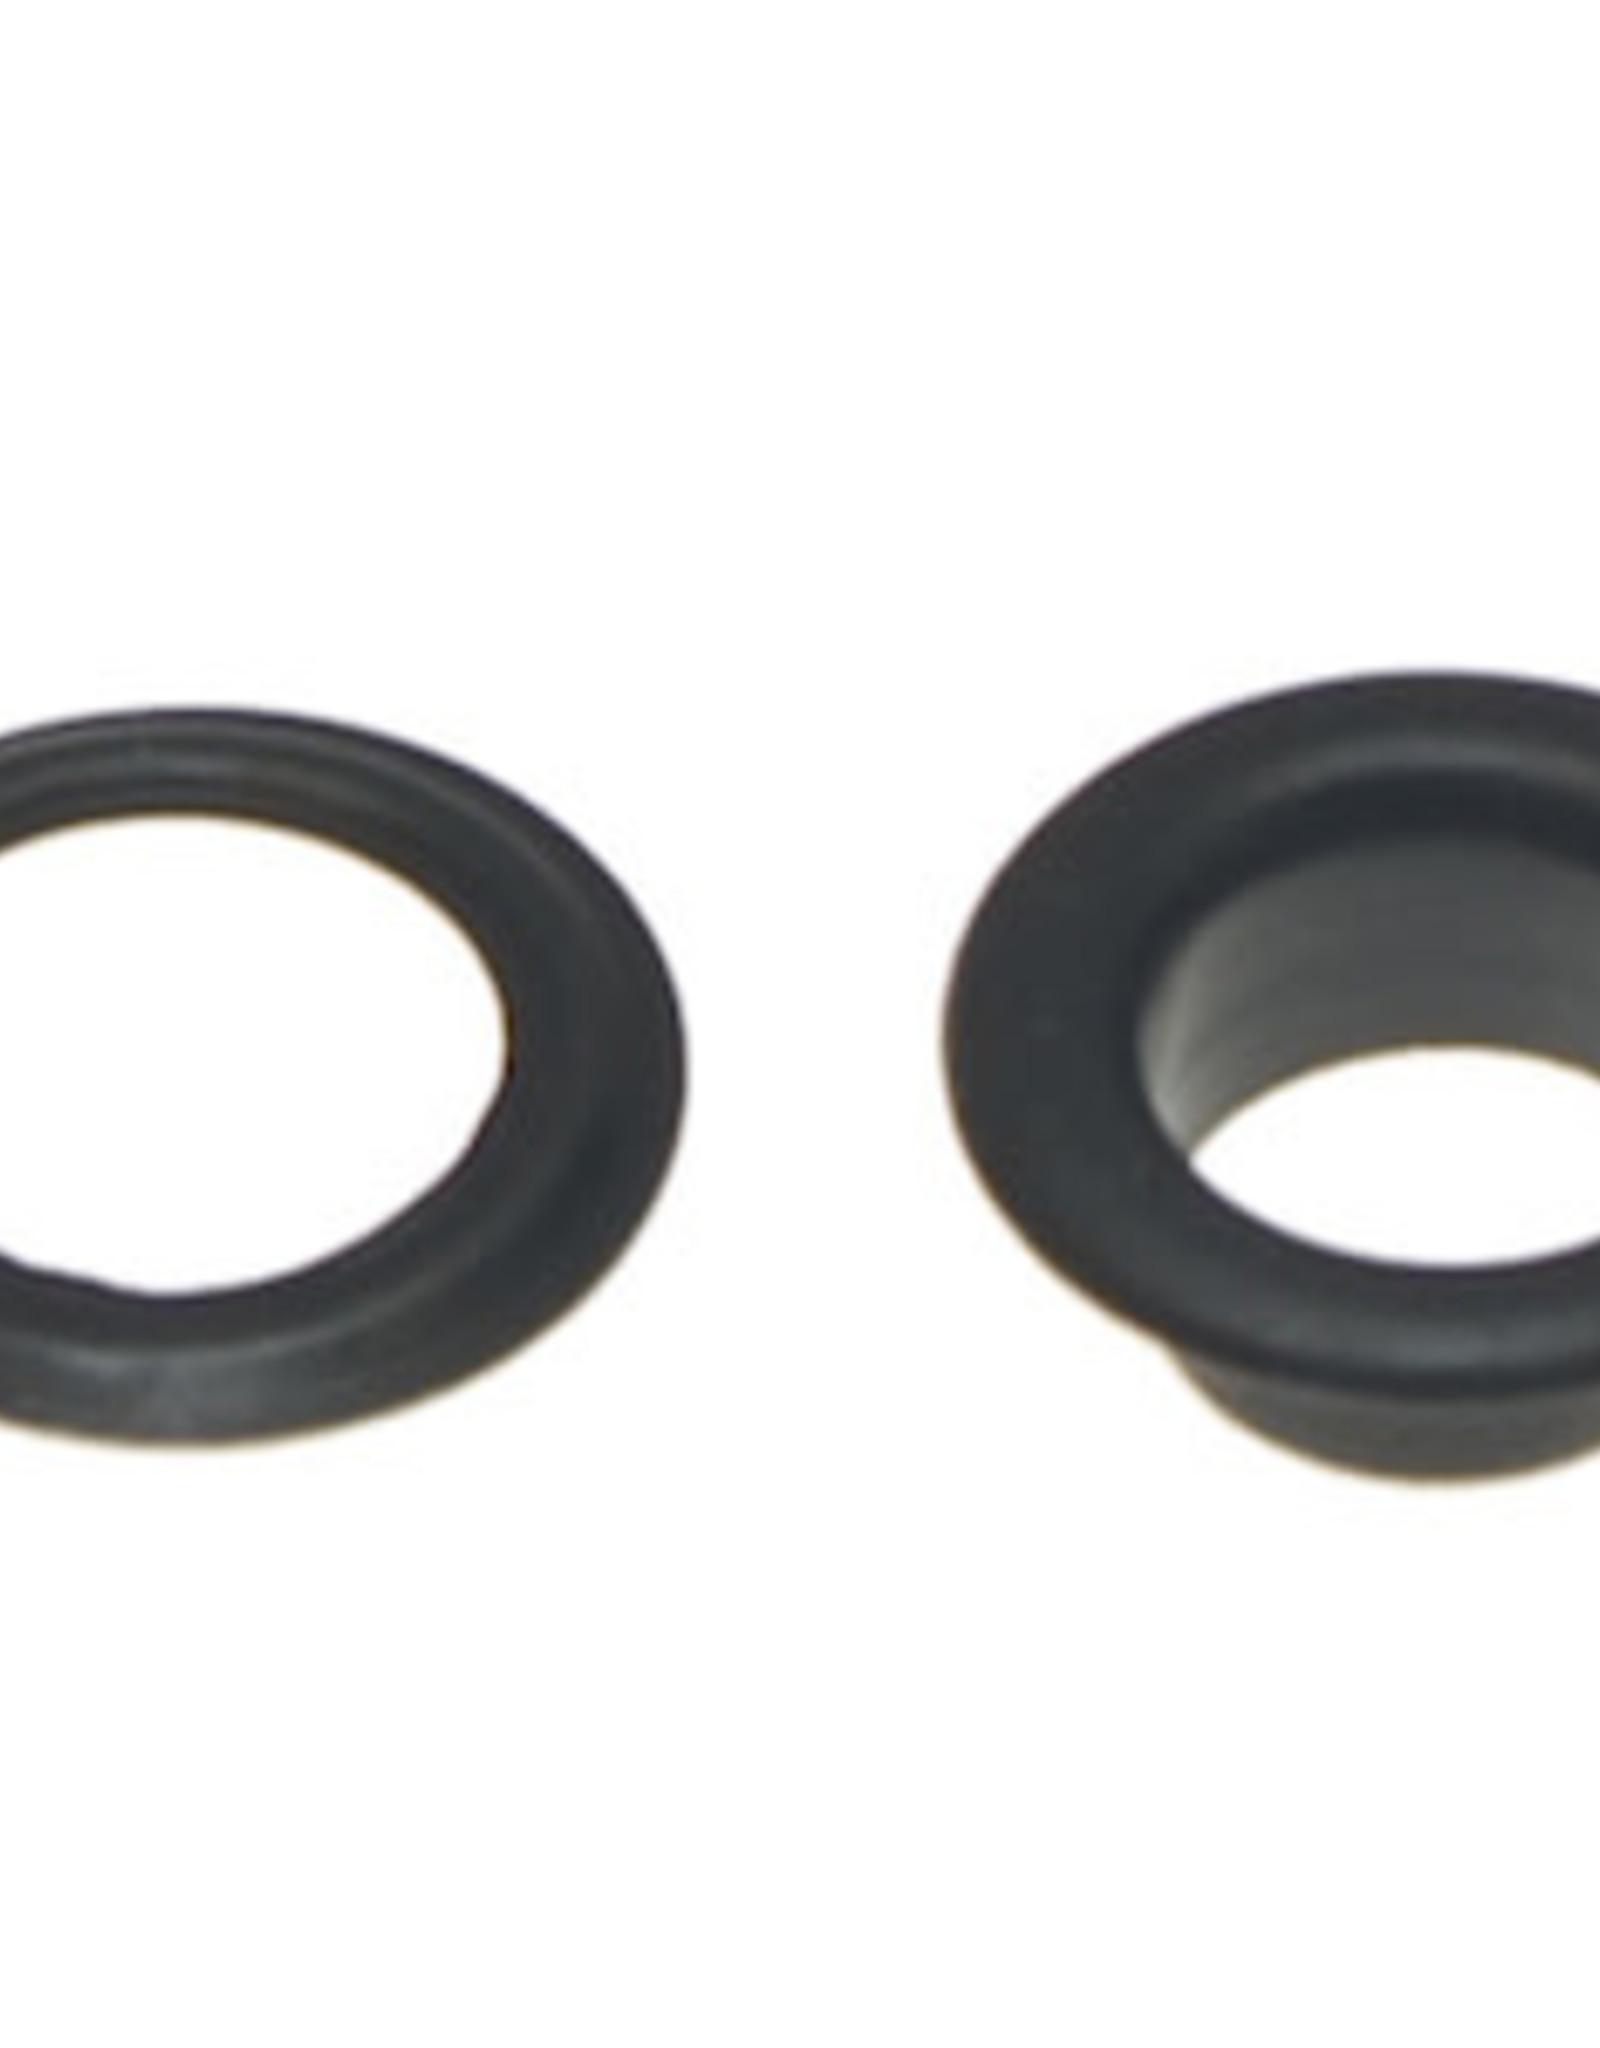 Nestels 8mm zwart staal